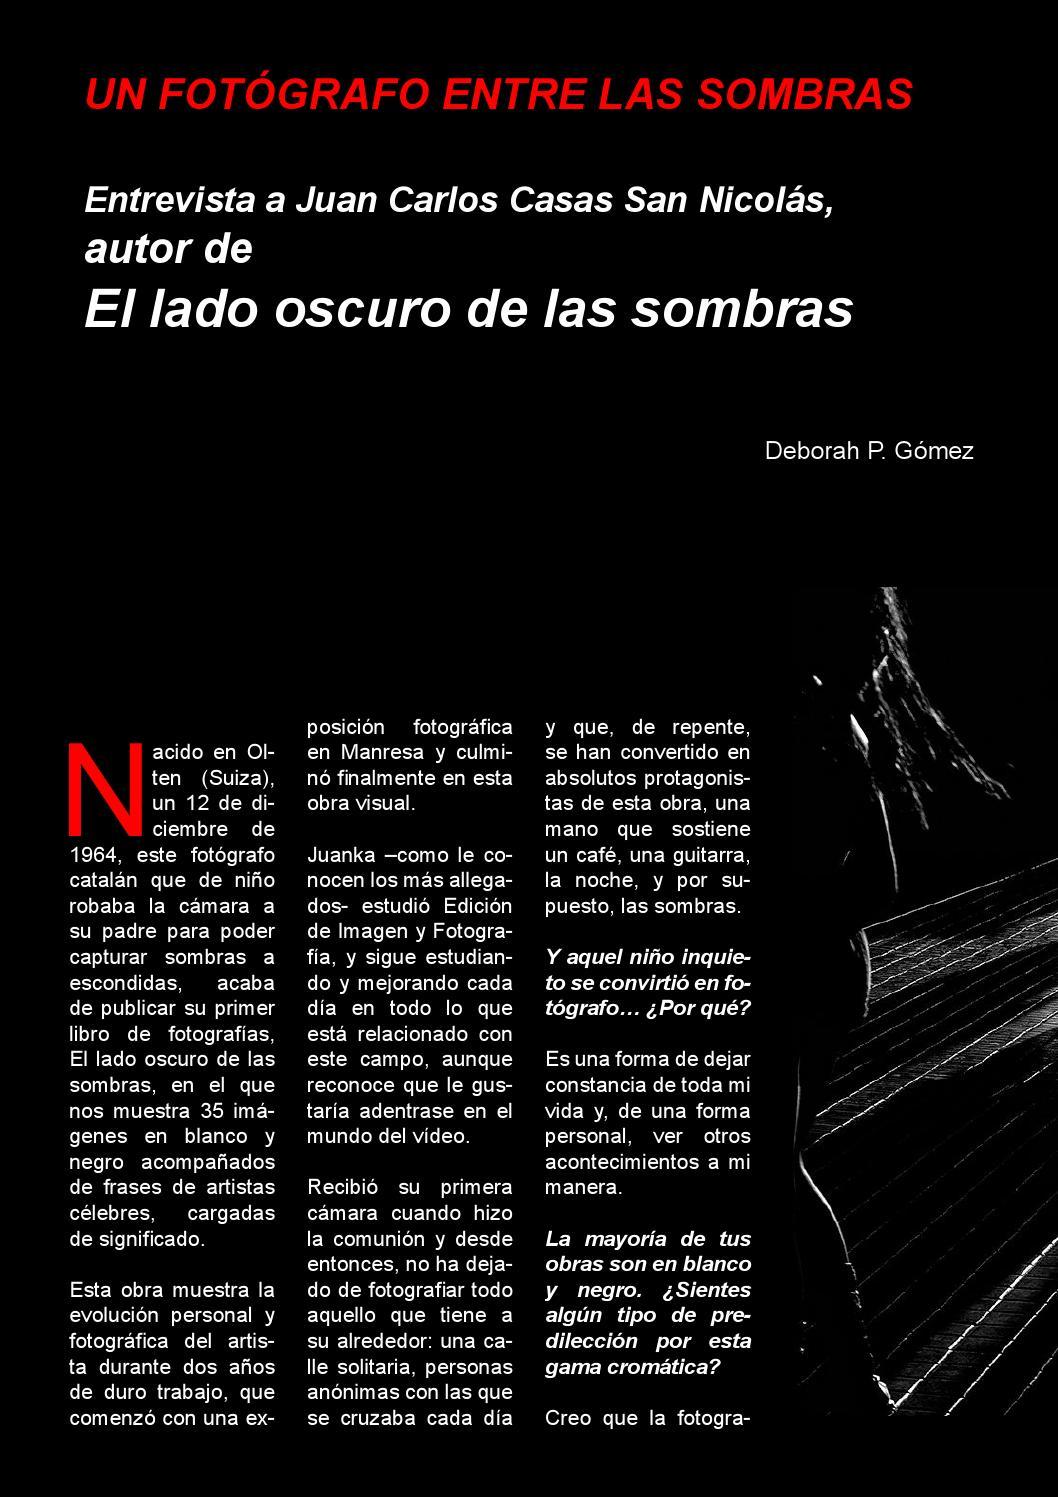 Noir Revista Cultural Número 17 Junio 2016 By Noir